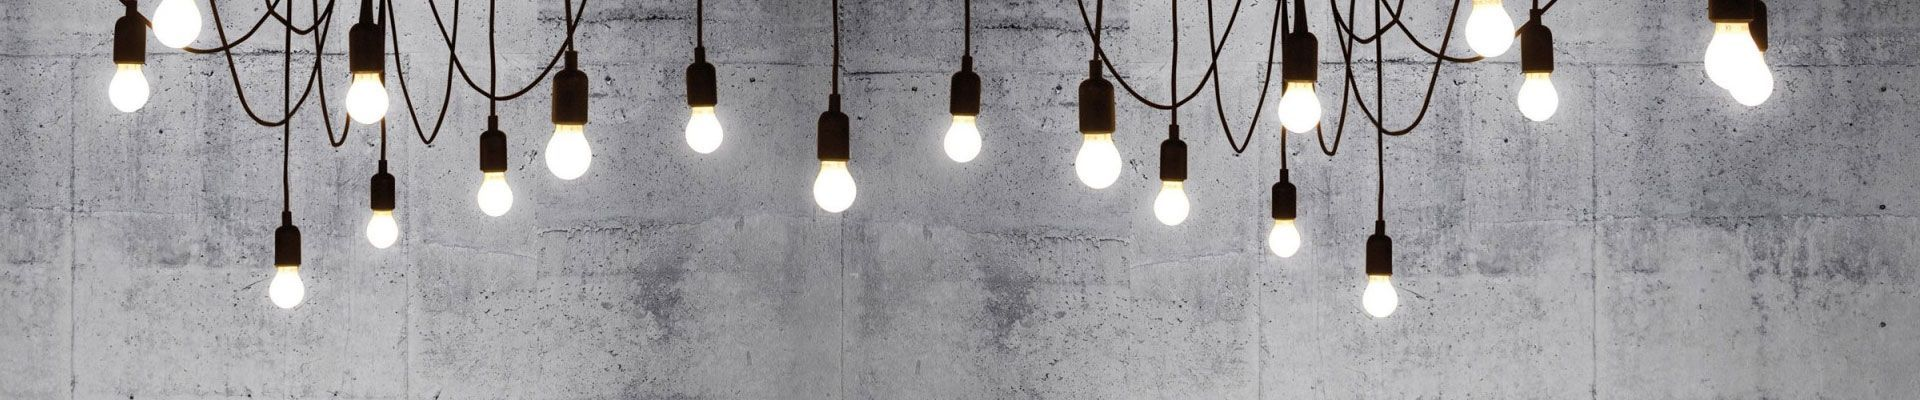 Seletti hanglampen